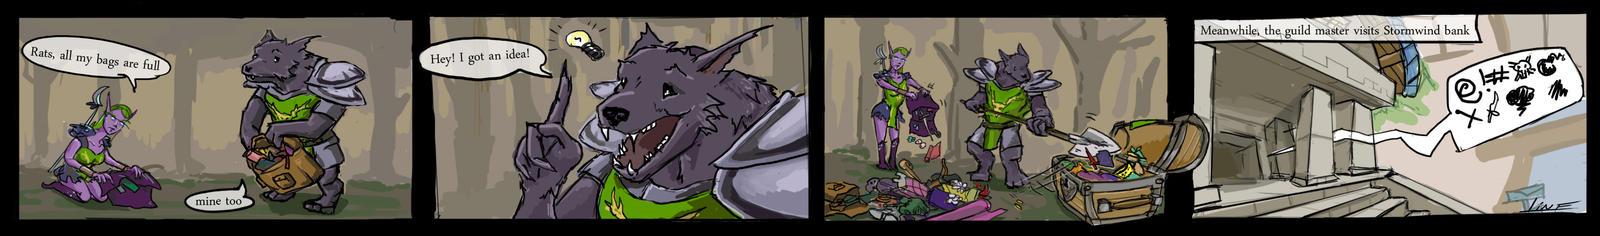 Druids of the Beast Guild bank by Druidsofthebeast